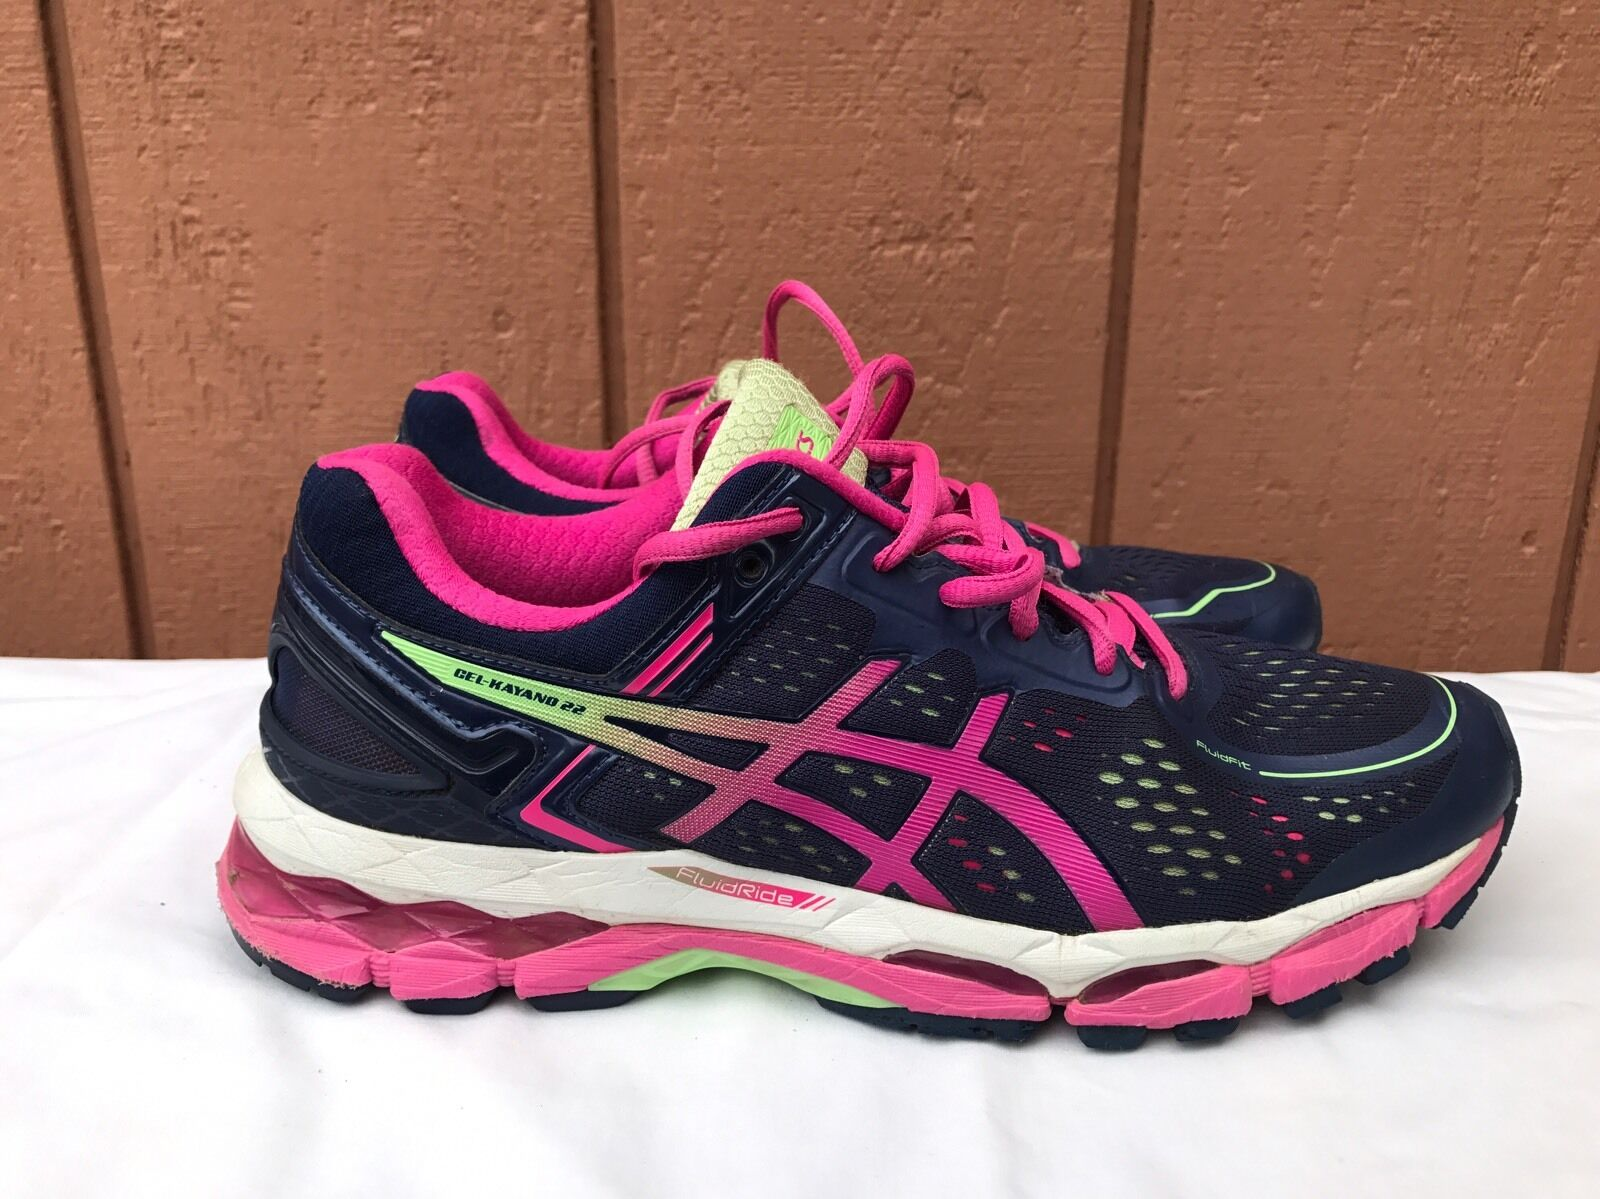 EUCAsics donna Kayano 22 Athletic Running scarpe T597N Indigo blu blu blu rosa US 9.5 c9c886